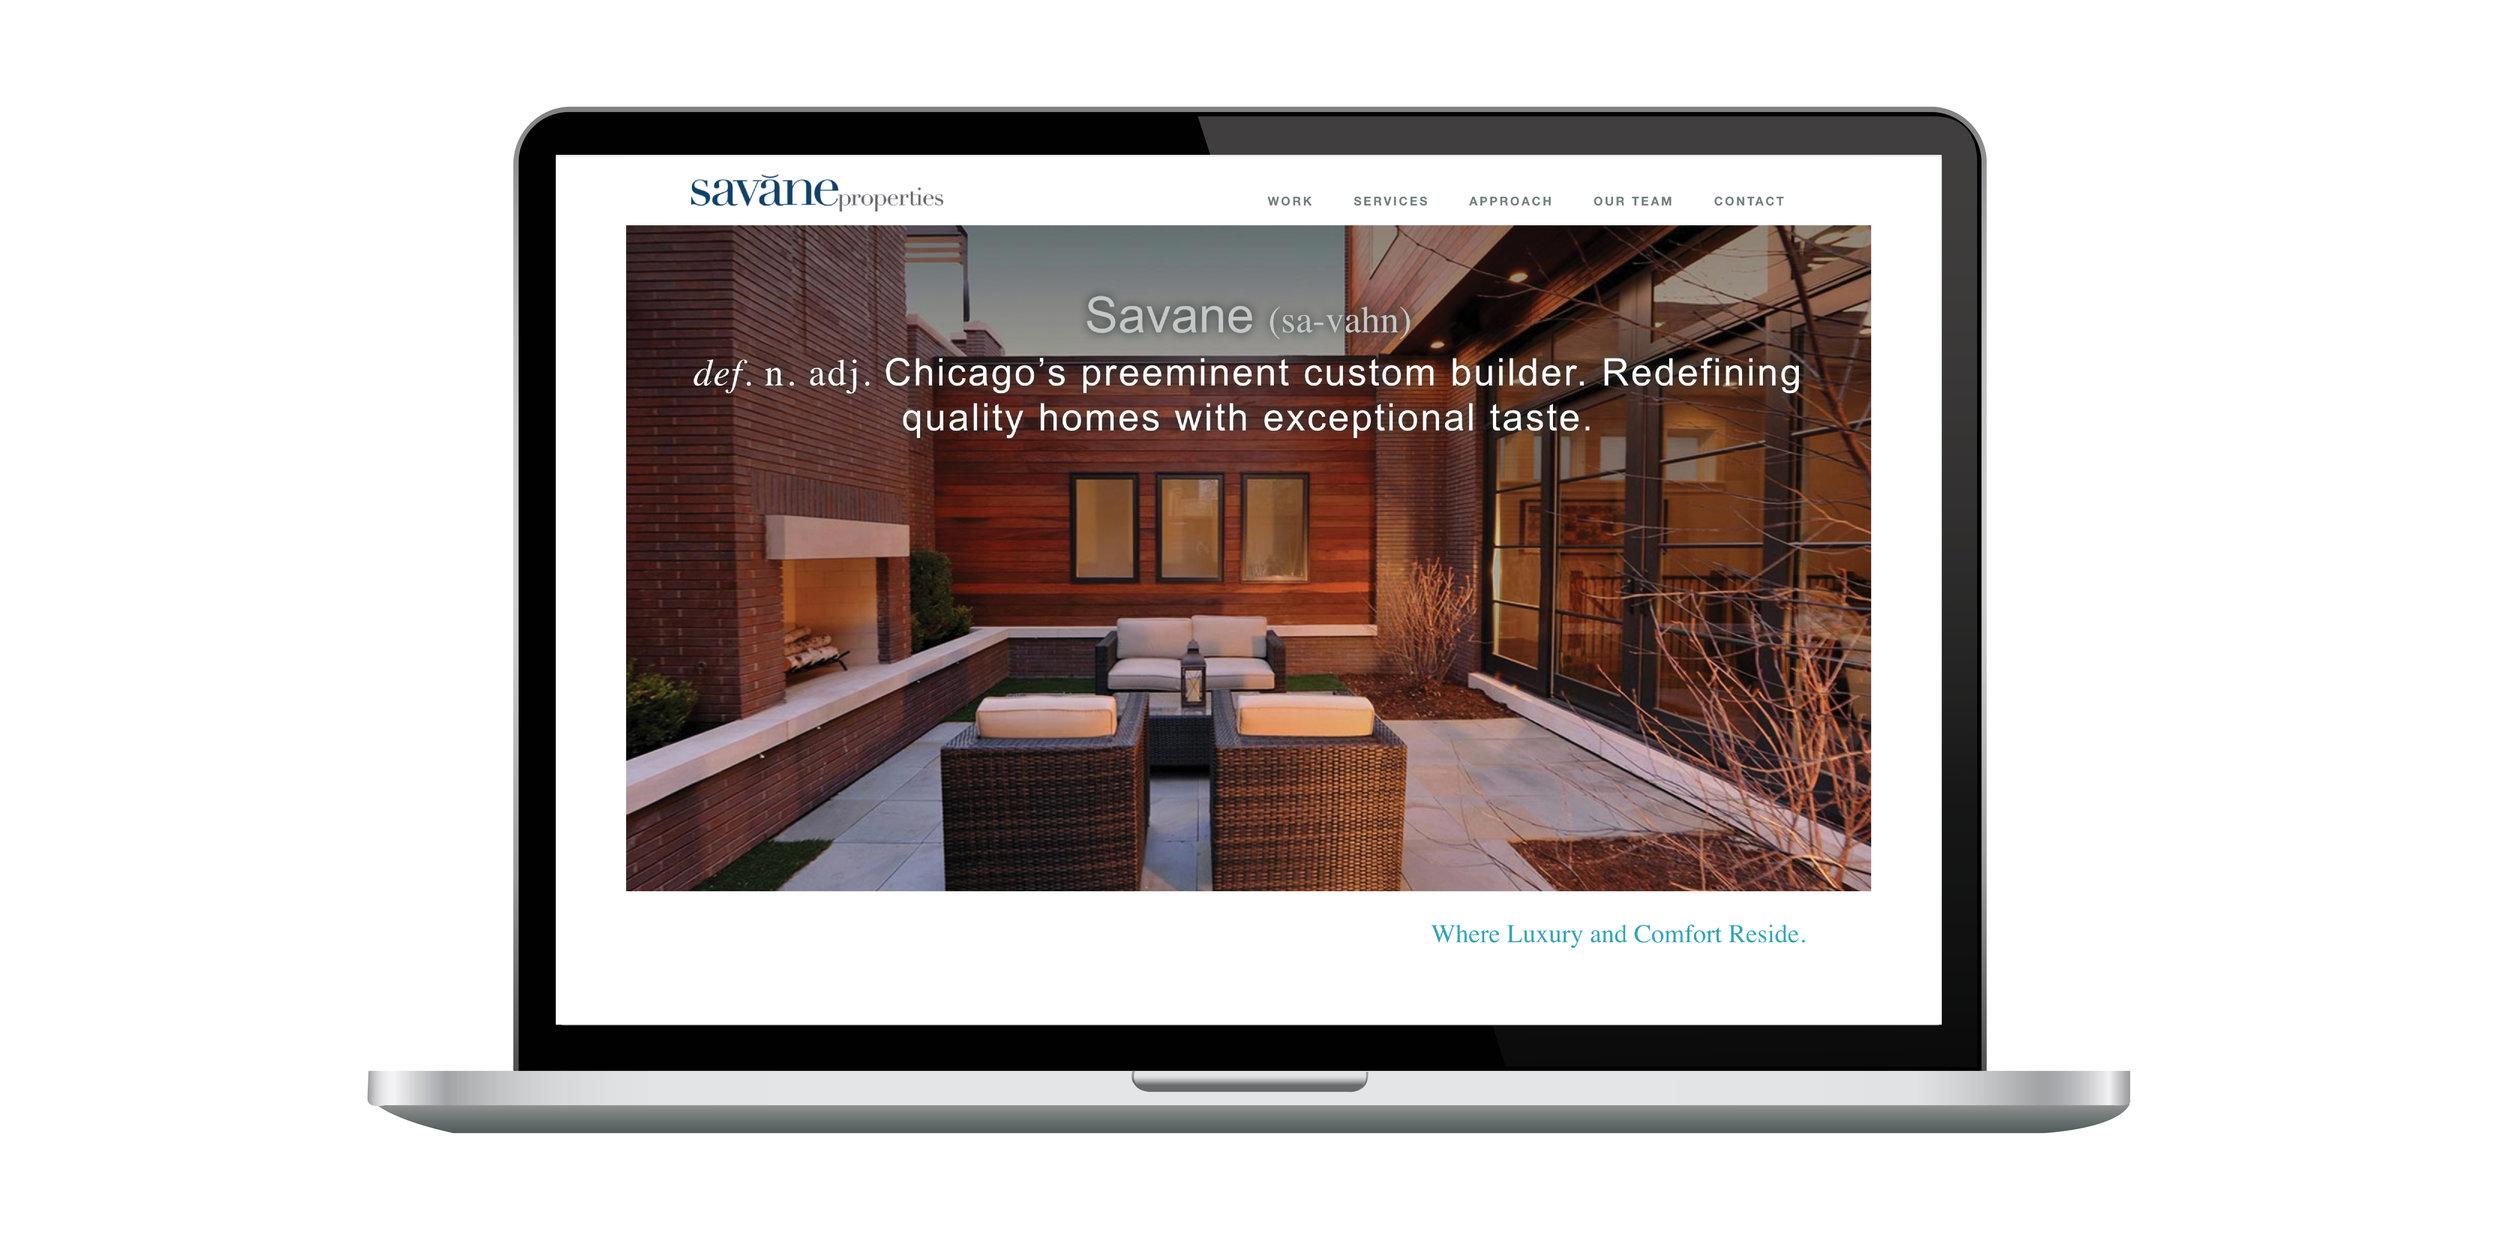 Forward Design Website Design_2019_Savane_1.jpg